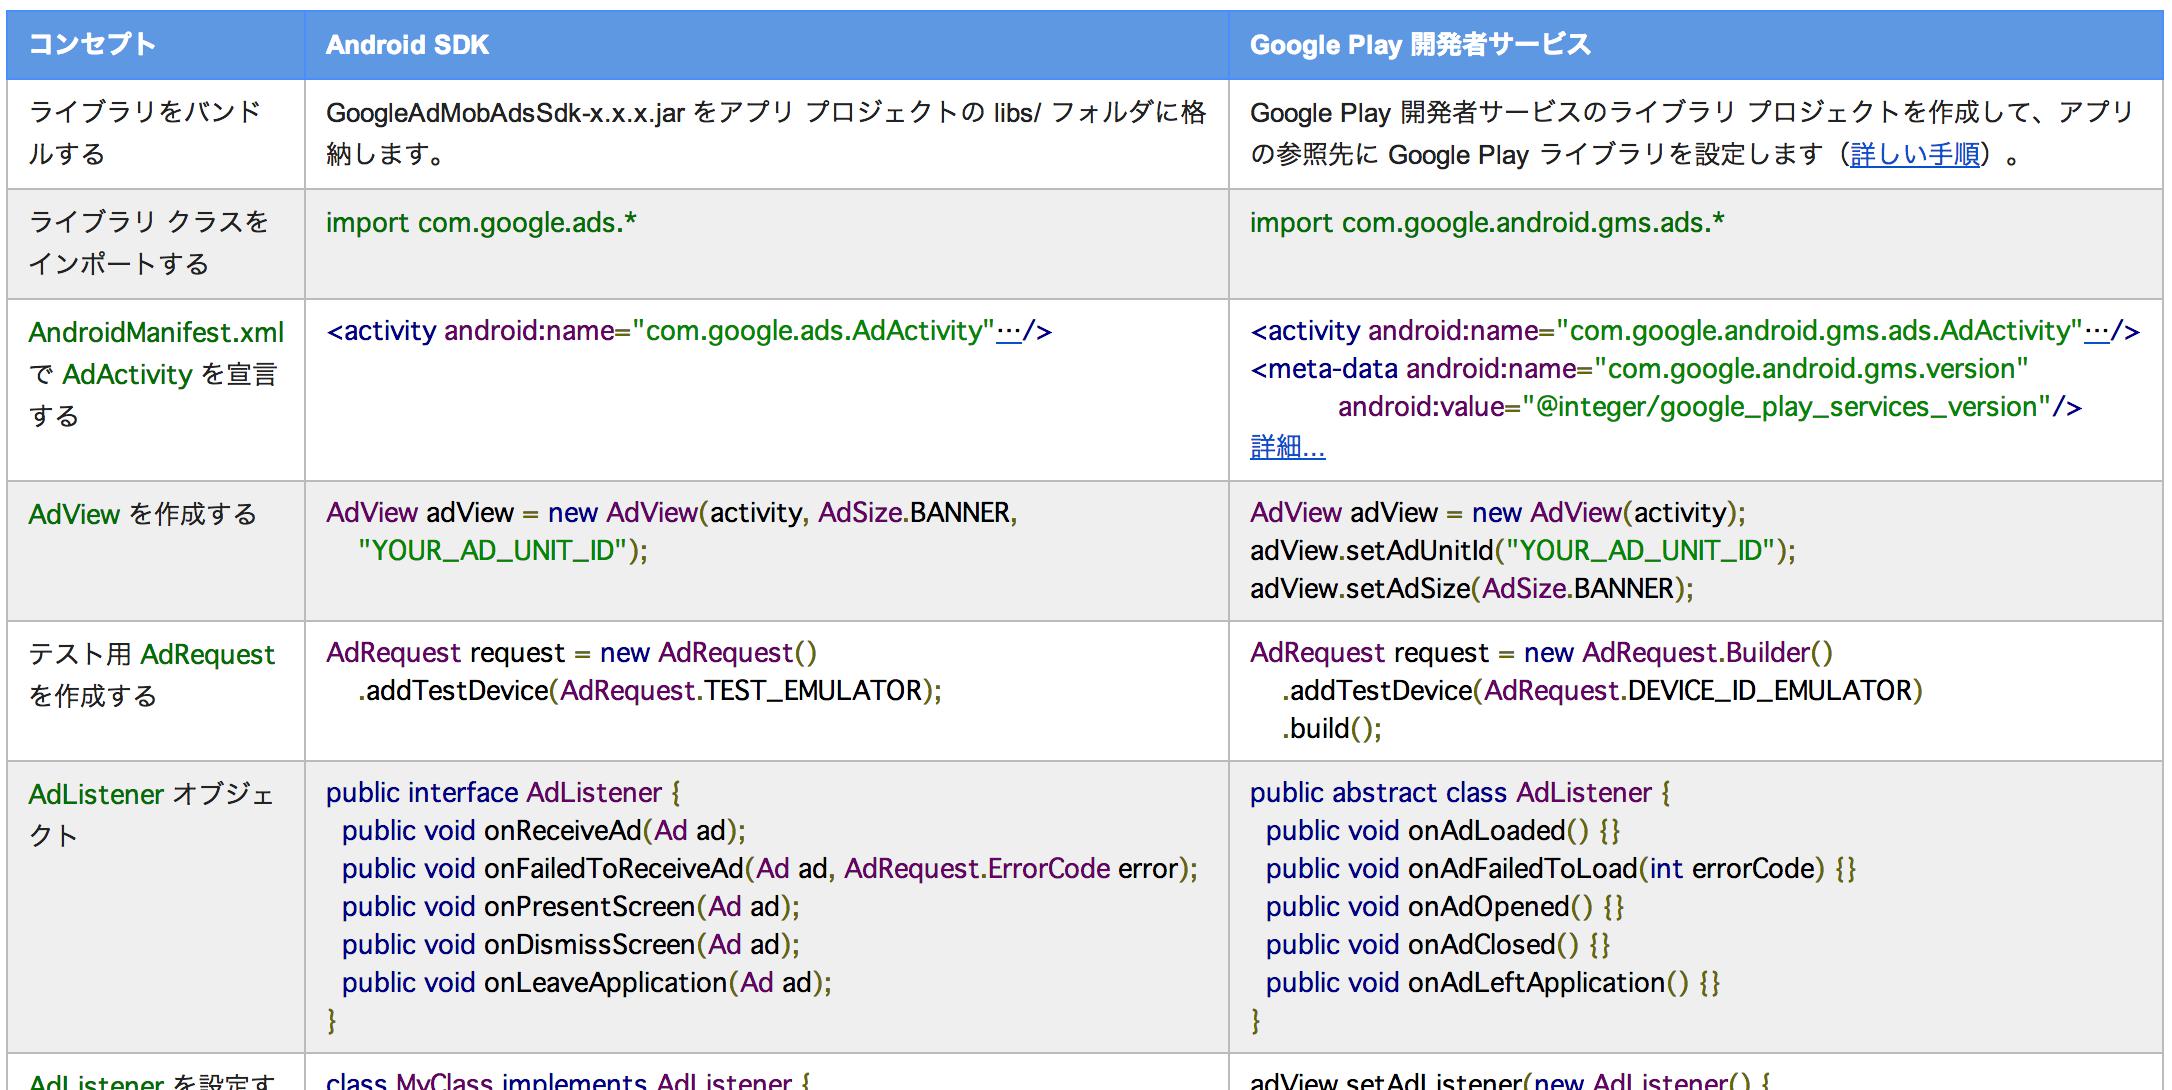 Google_Play_開発者サービスへの移行_-_Google_Mobile_Ads_SDK_—_Google_Developers